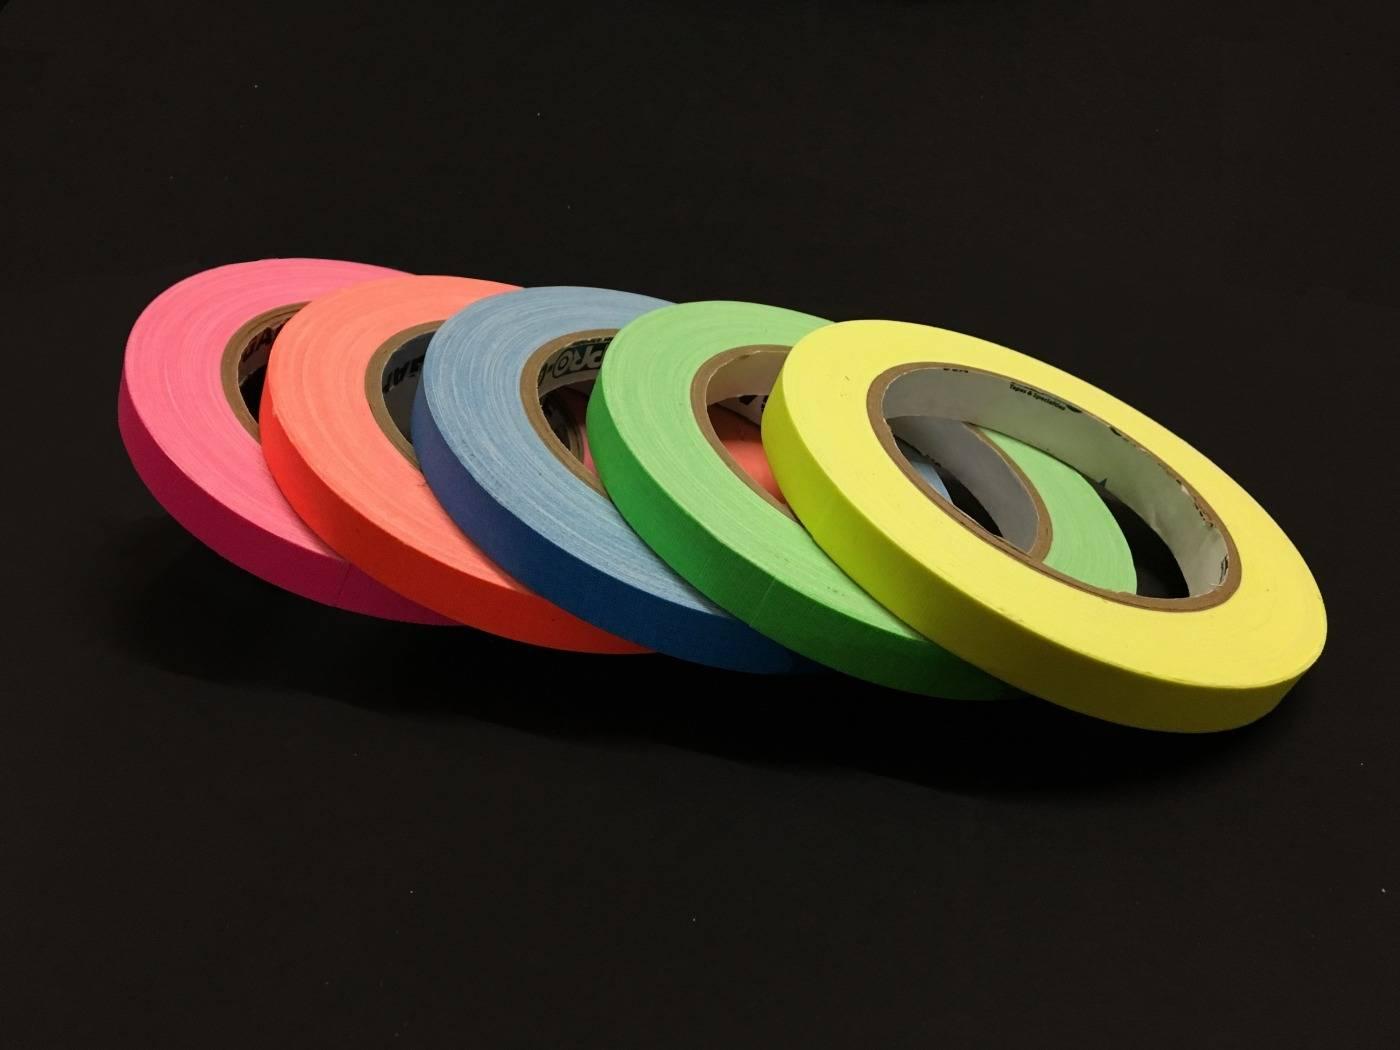 Uv Licht Kopen : Uv glow tape geel mm glow in the dark verf sfx make up